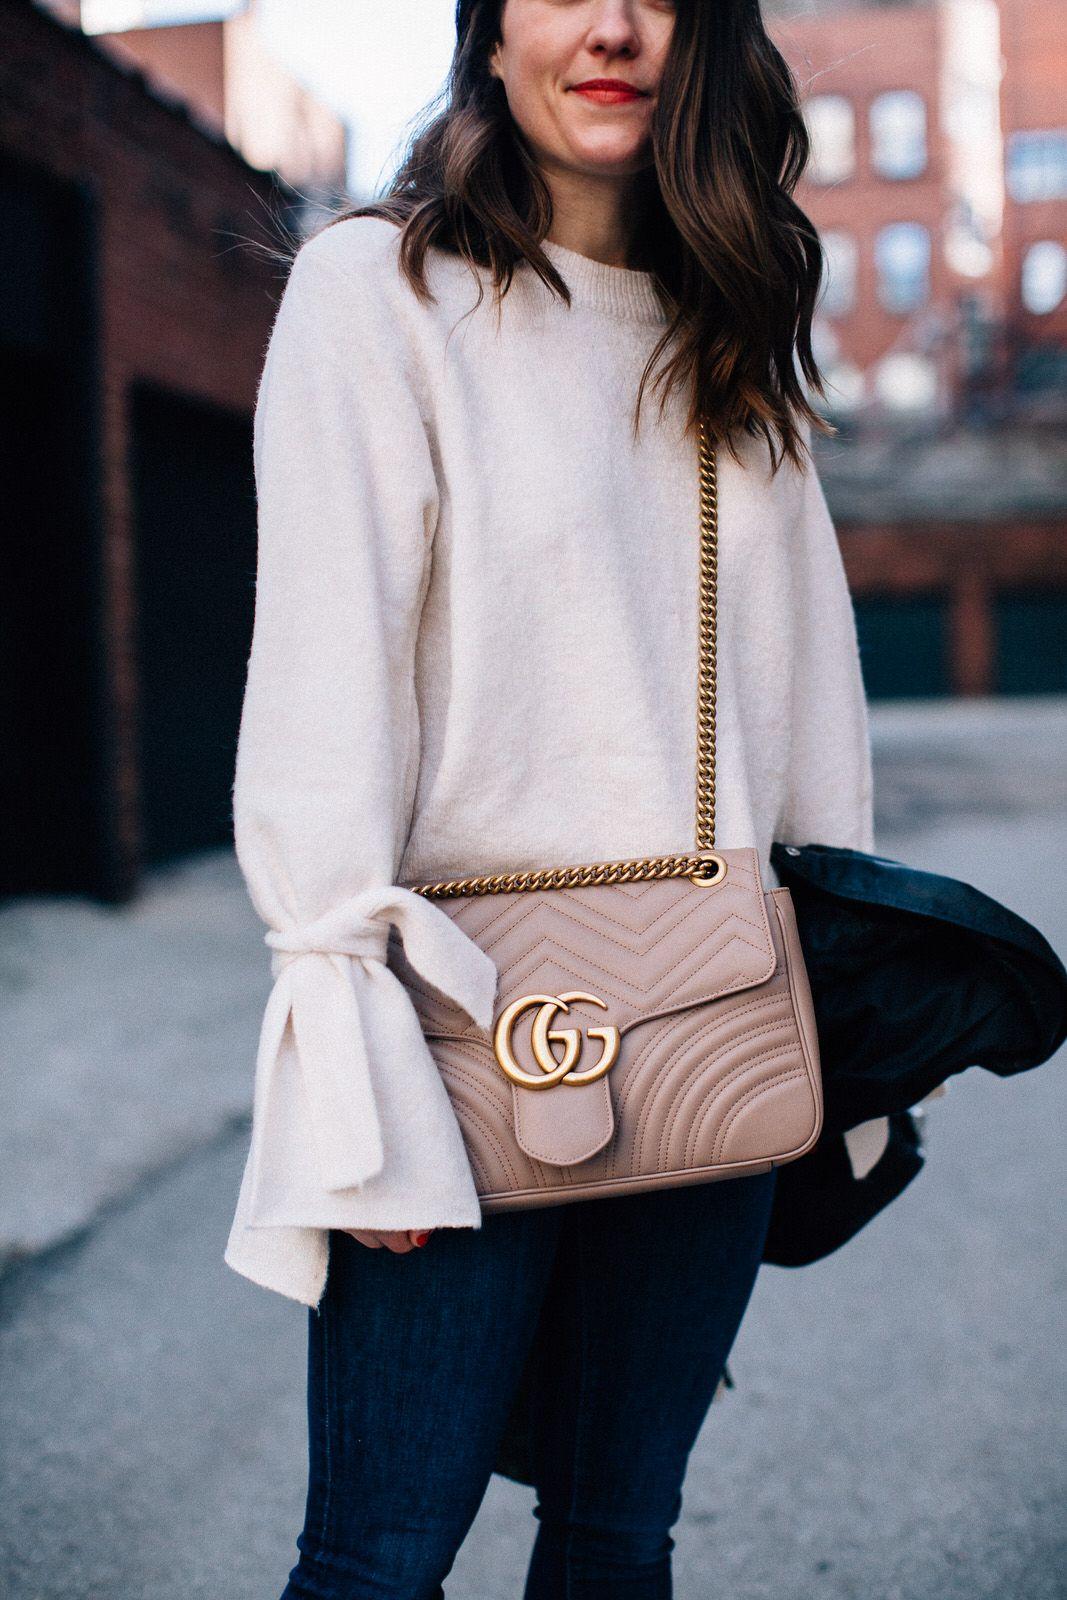 939ede27d60 Gucci Marmont bag  guccimarmont  gucci